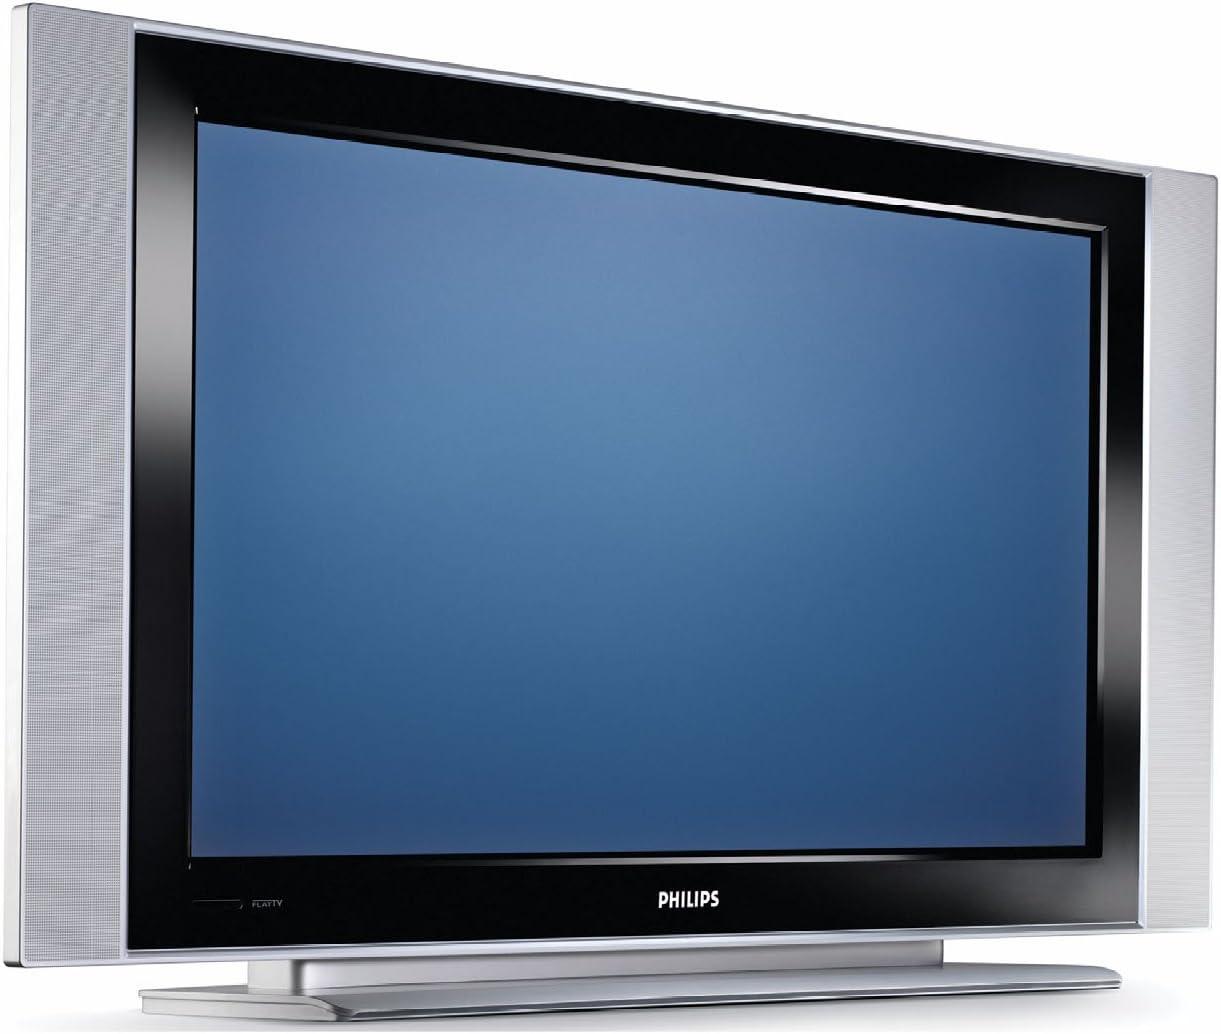 Philips 37PF5521D - Televisión HD, Pantalla LCD 37 pulgadas- Plata ...